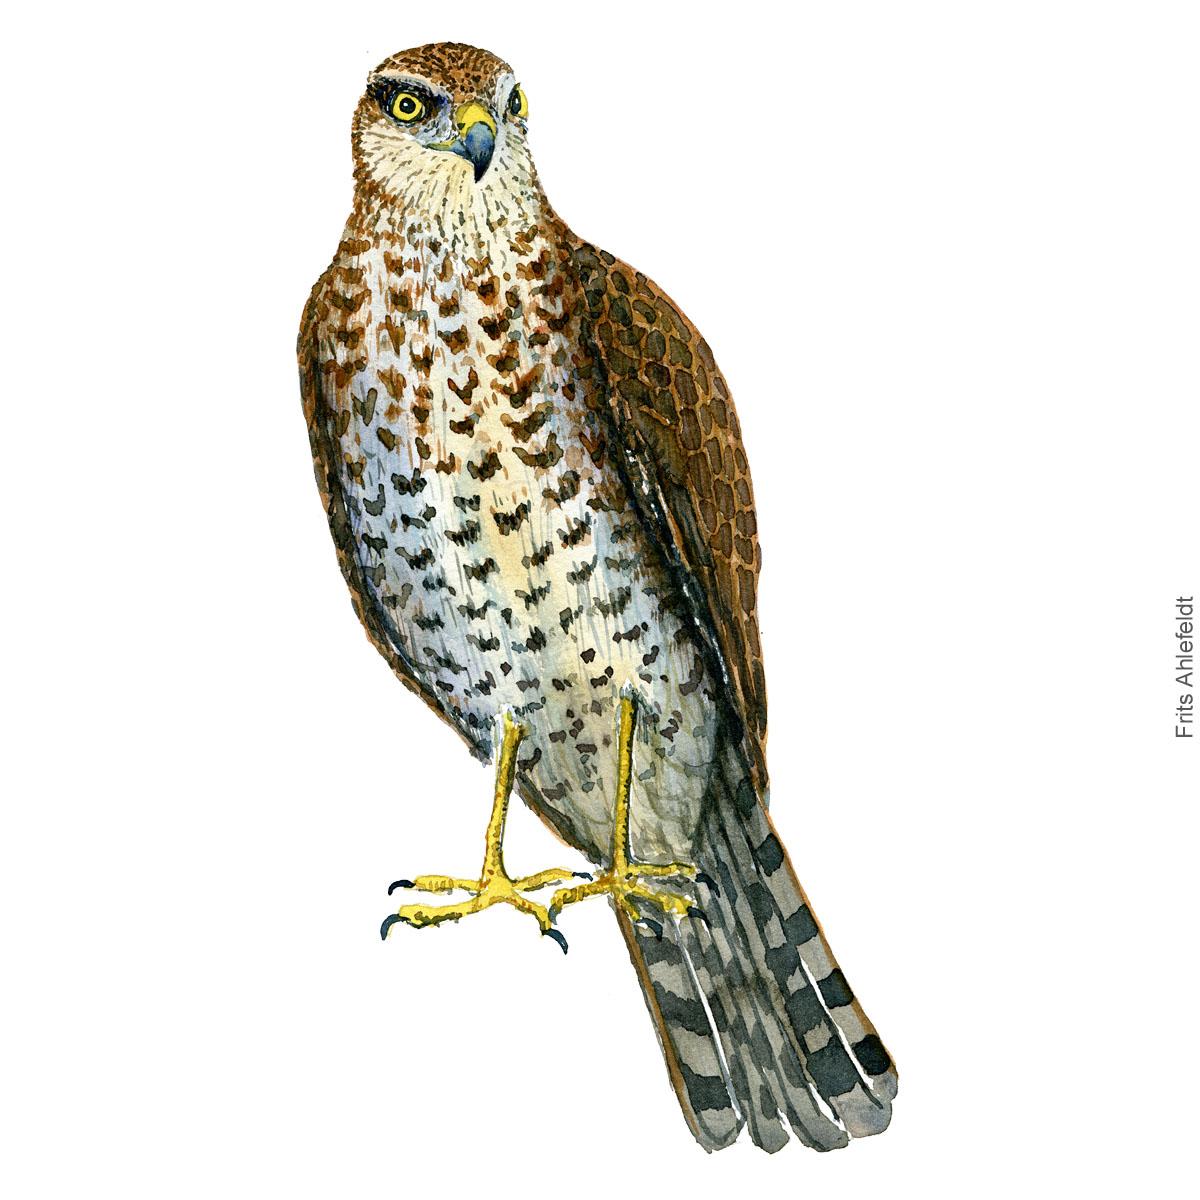 Eurasian sparrow hawk - Spurvehøg Akvarel. Watercolor bird illustration by Frits Ahlefeldt